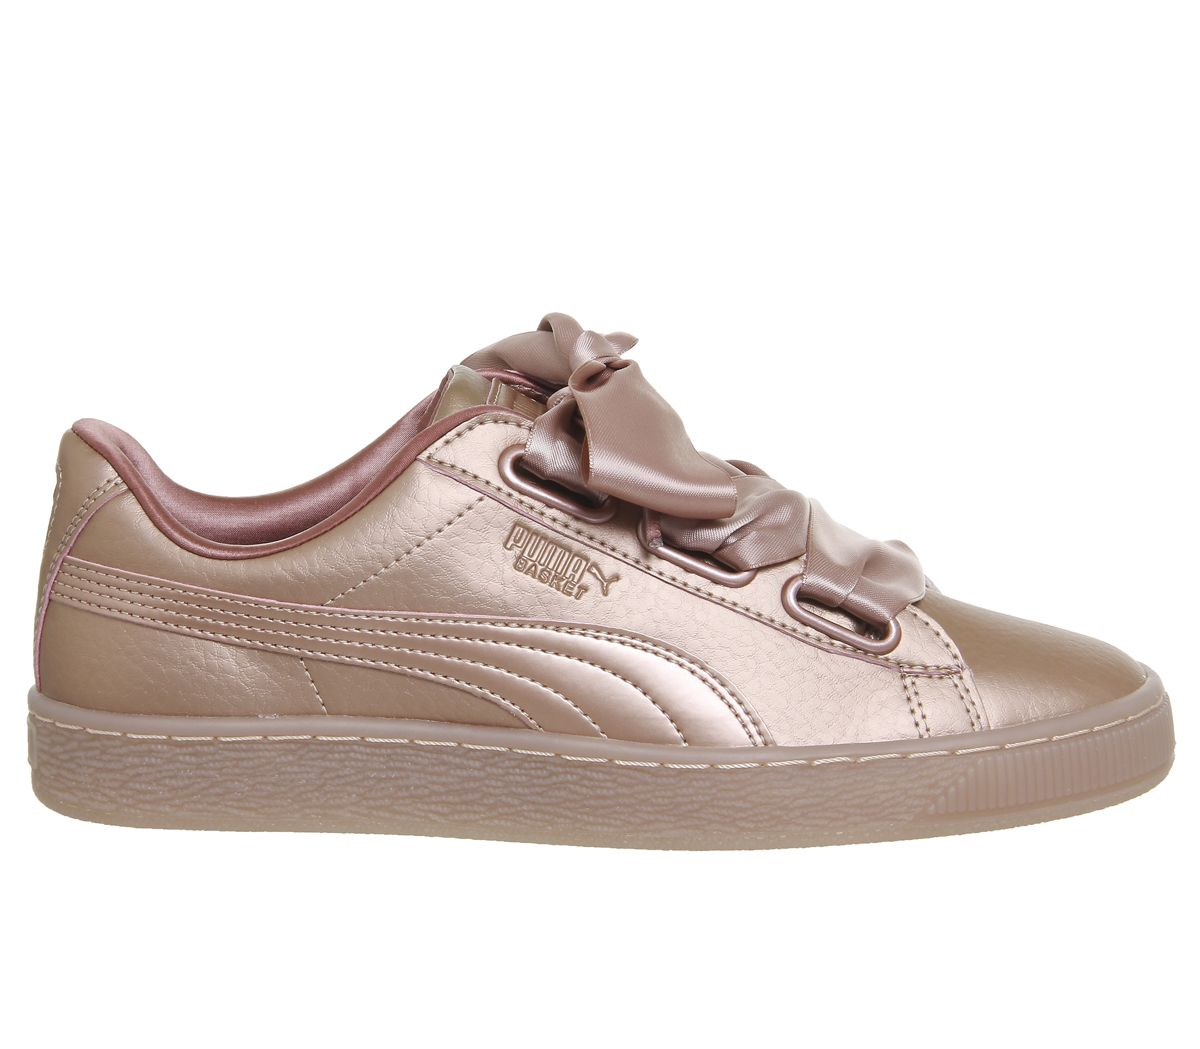 f6414a34f Puma Basket Heart Trainers Rose Copper Metallic - Hers trainers